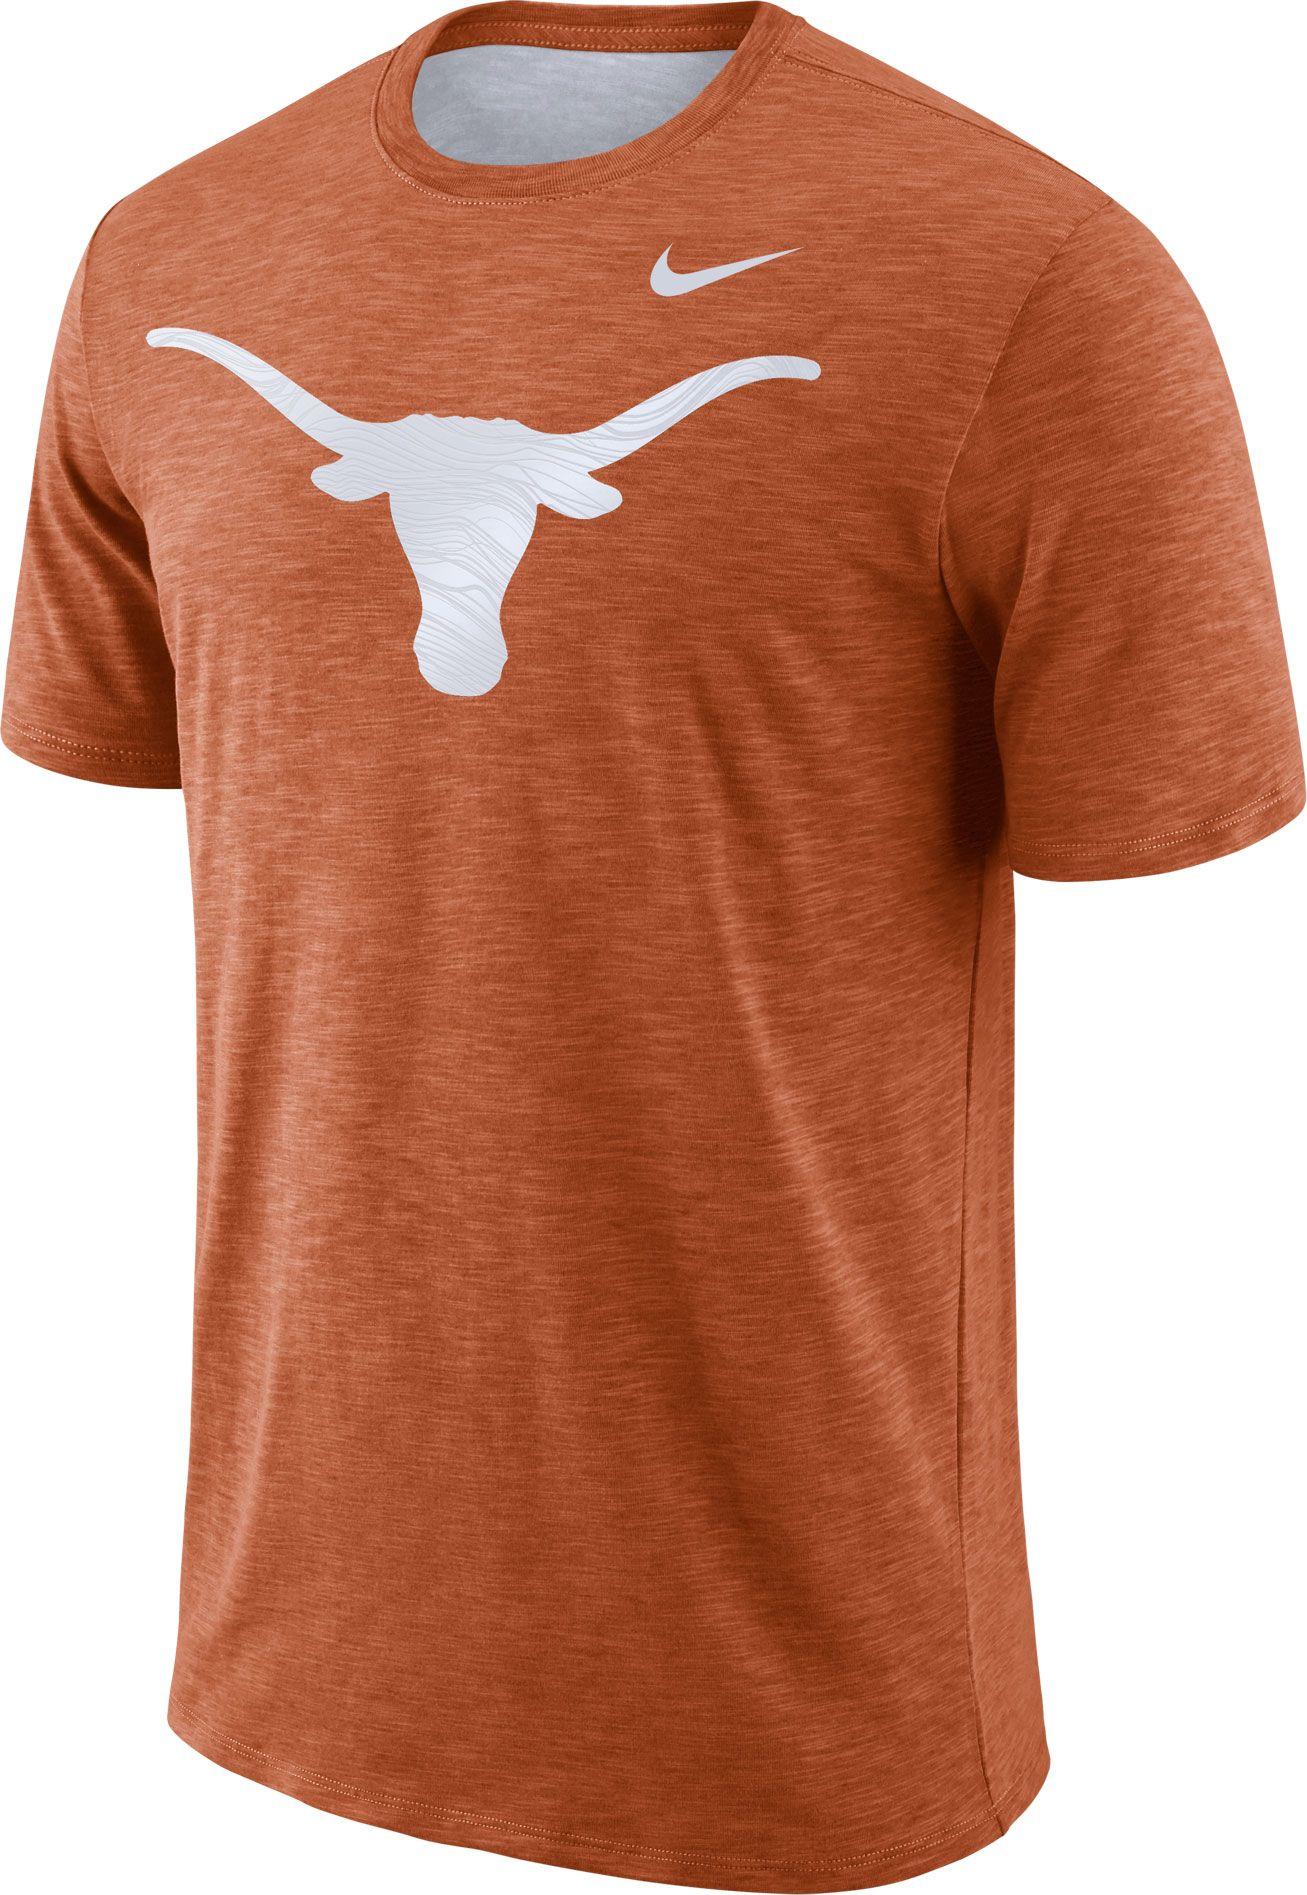 a062d7c8 Nike Men's Texas Longhorns Burnt Orange Dri-FIT Football Sideline Slub T- Shirt, Team